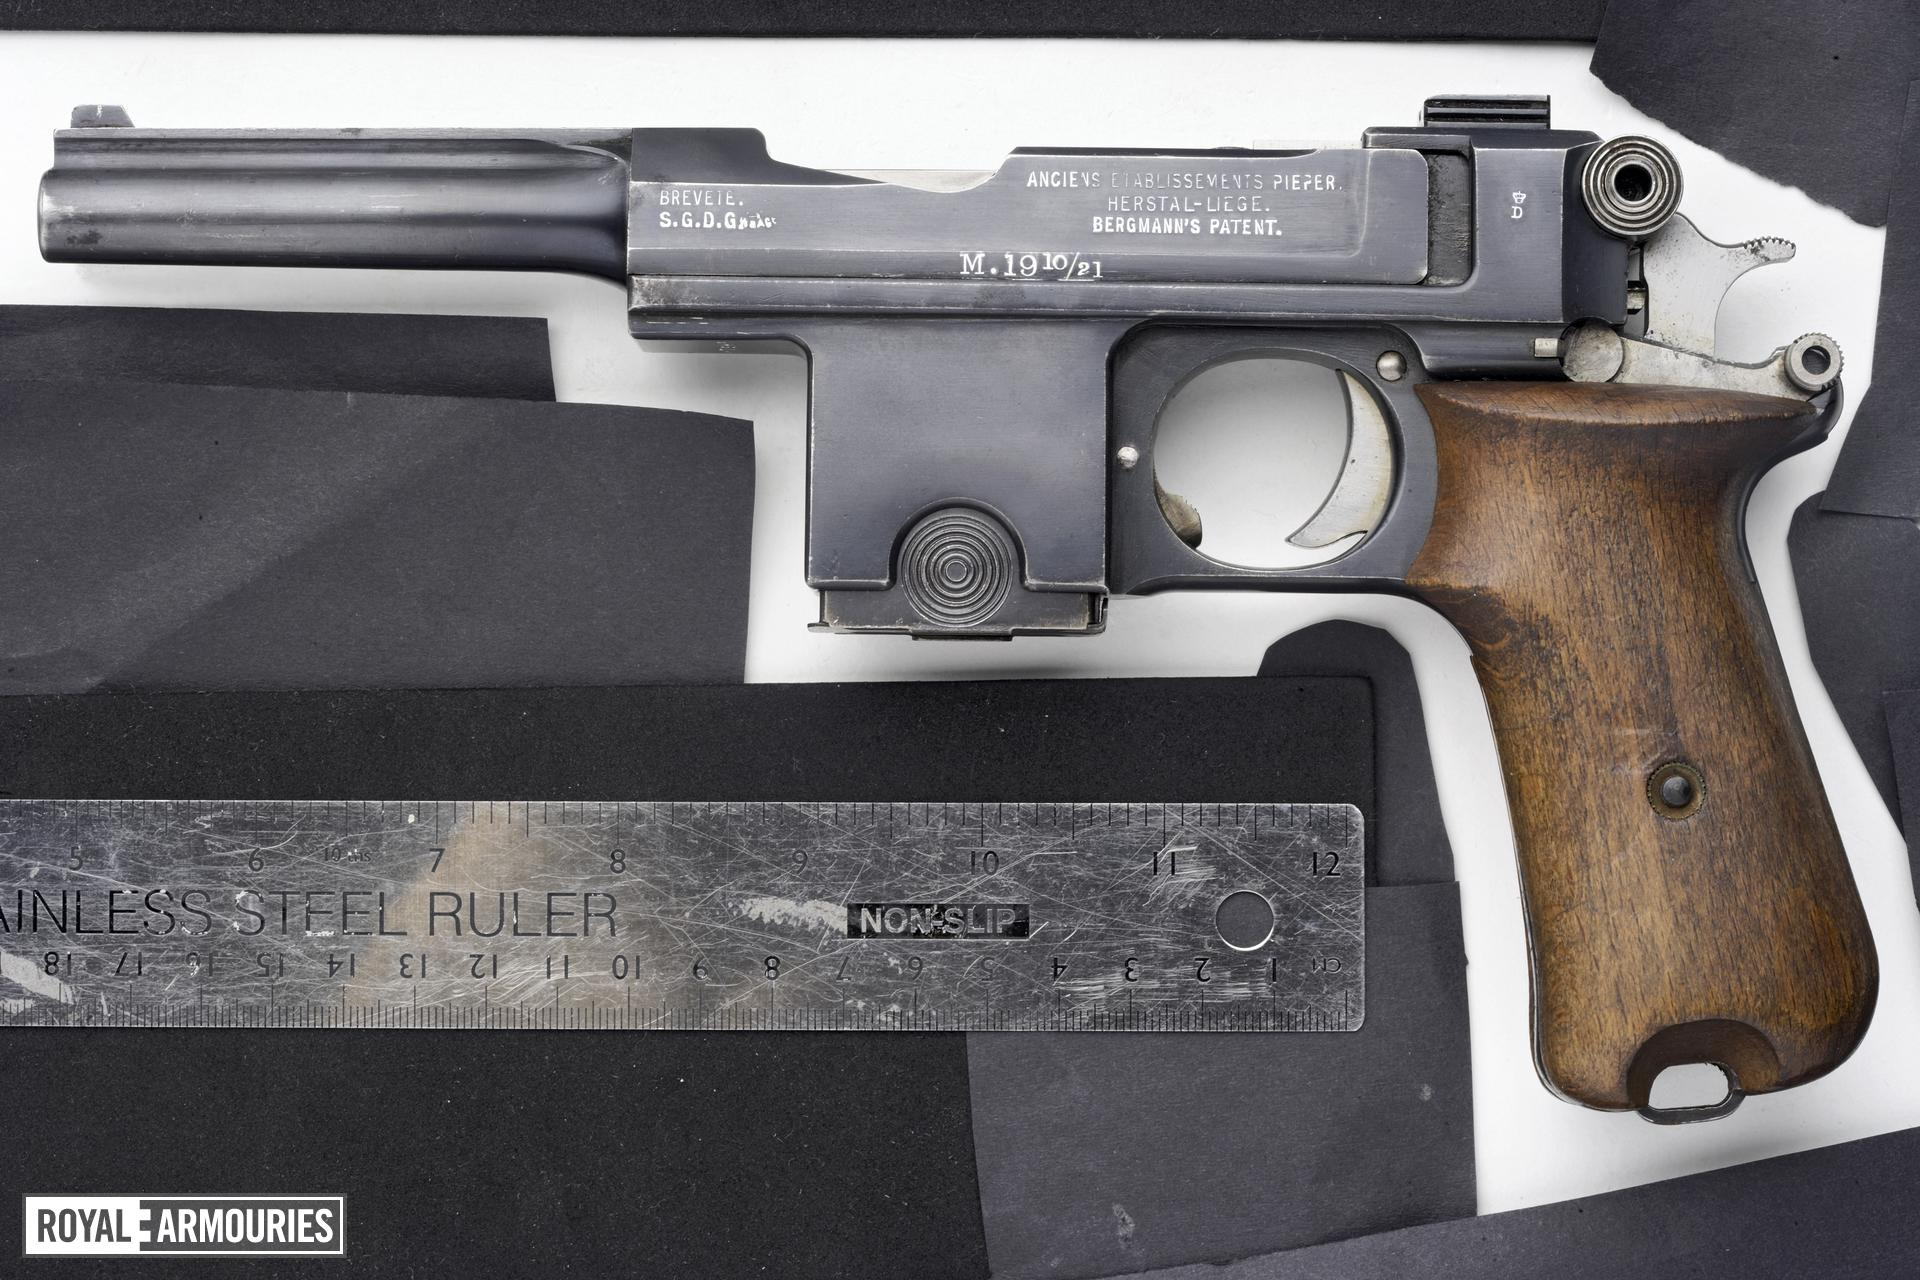 Centrefire self-loading pistol - Bergmann Bayard Model 1910/21